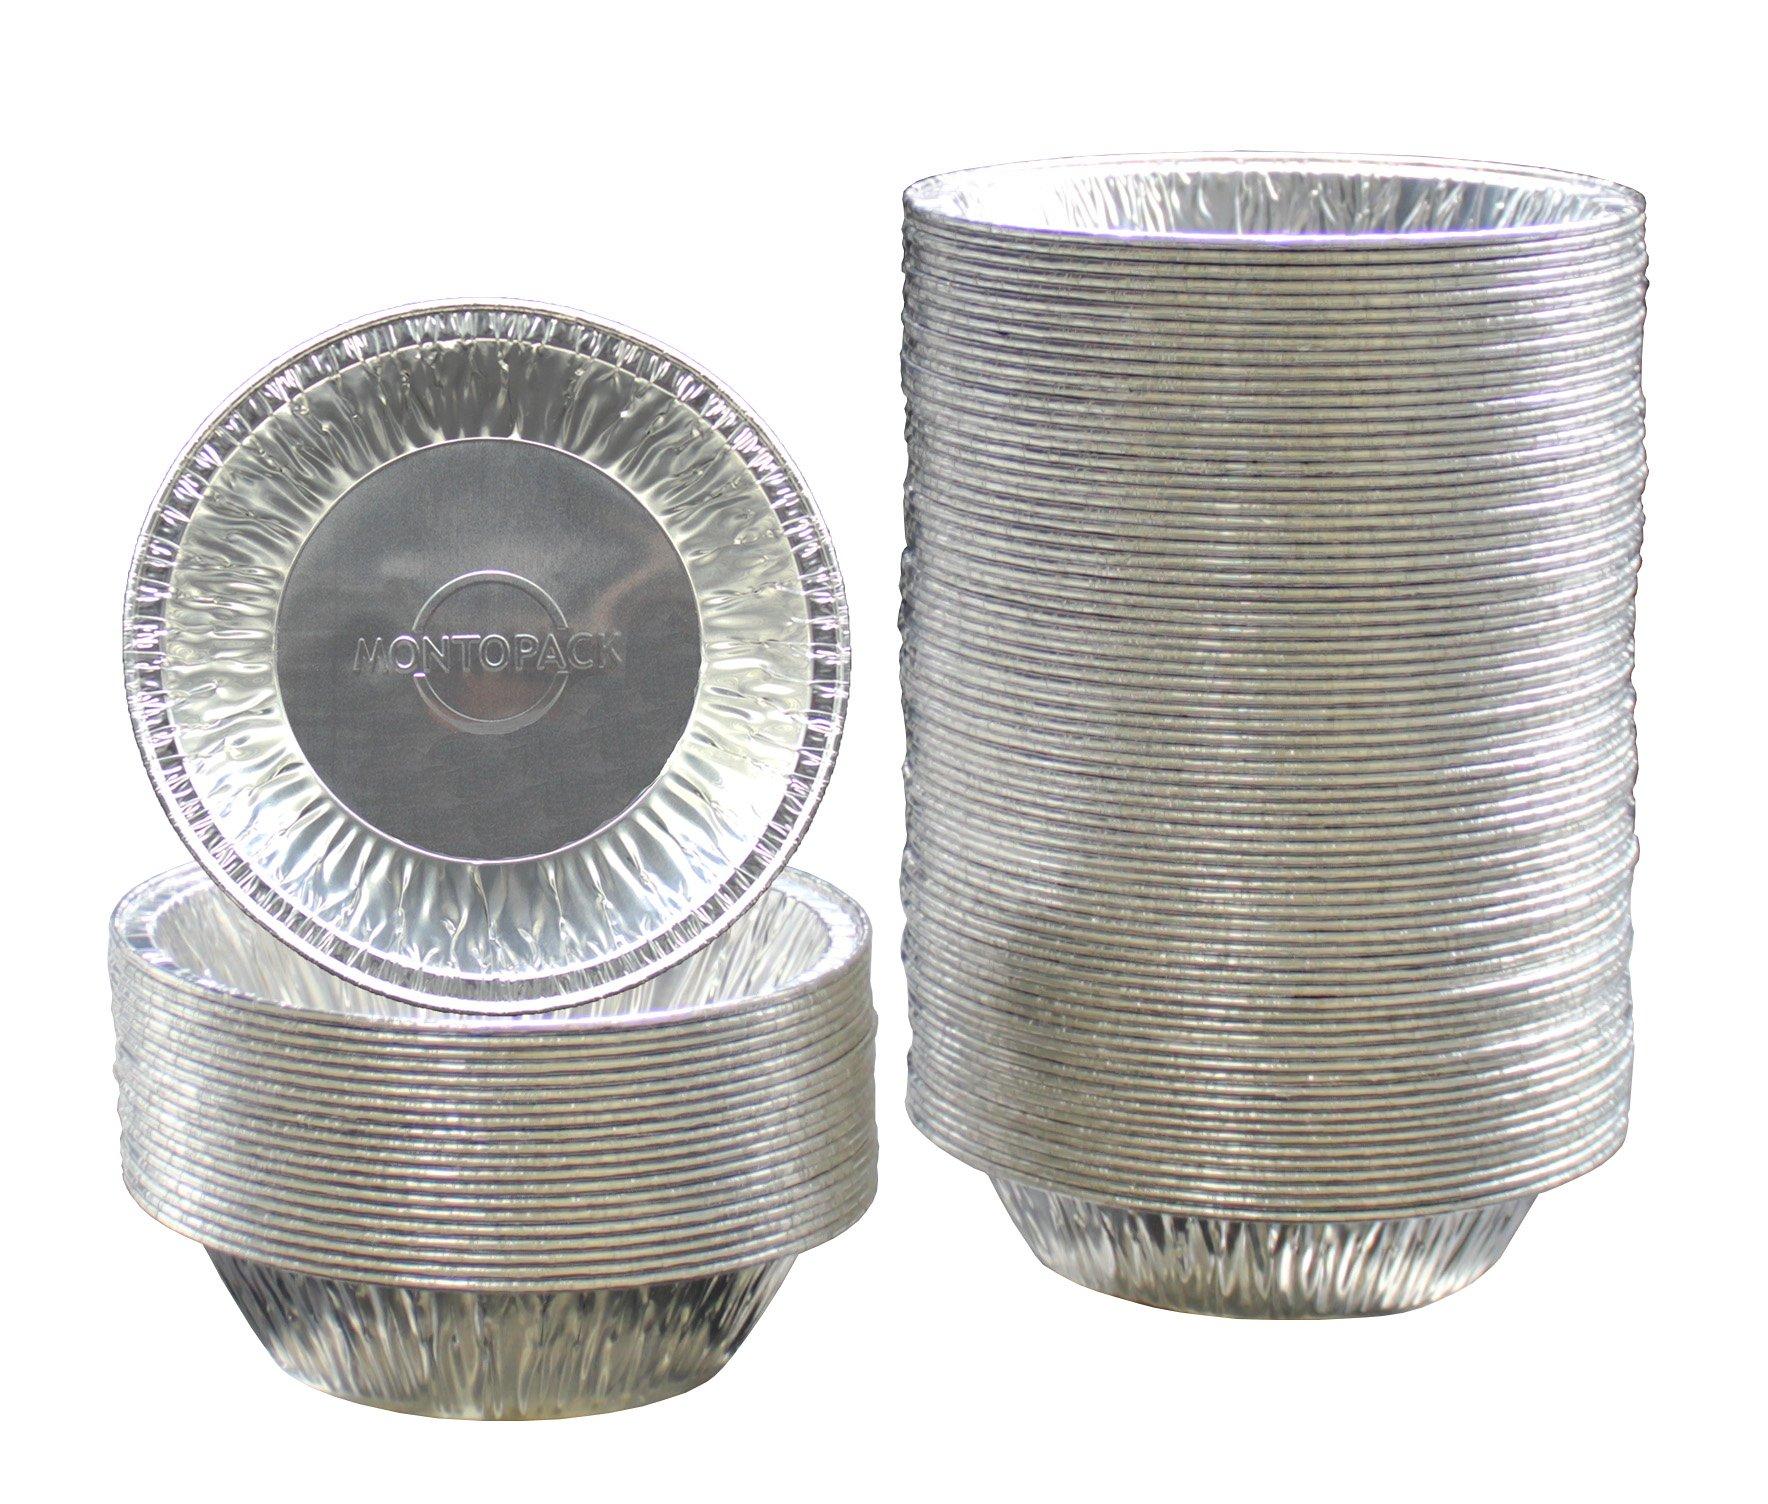 "MontoPack Disposable 5"" Aluminum Foil Tart/Pie Tins Pans (100 Pack)"